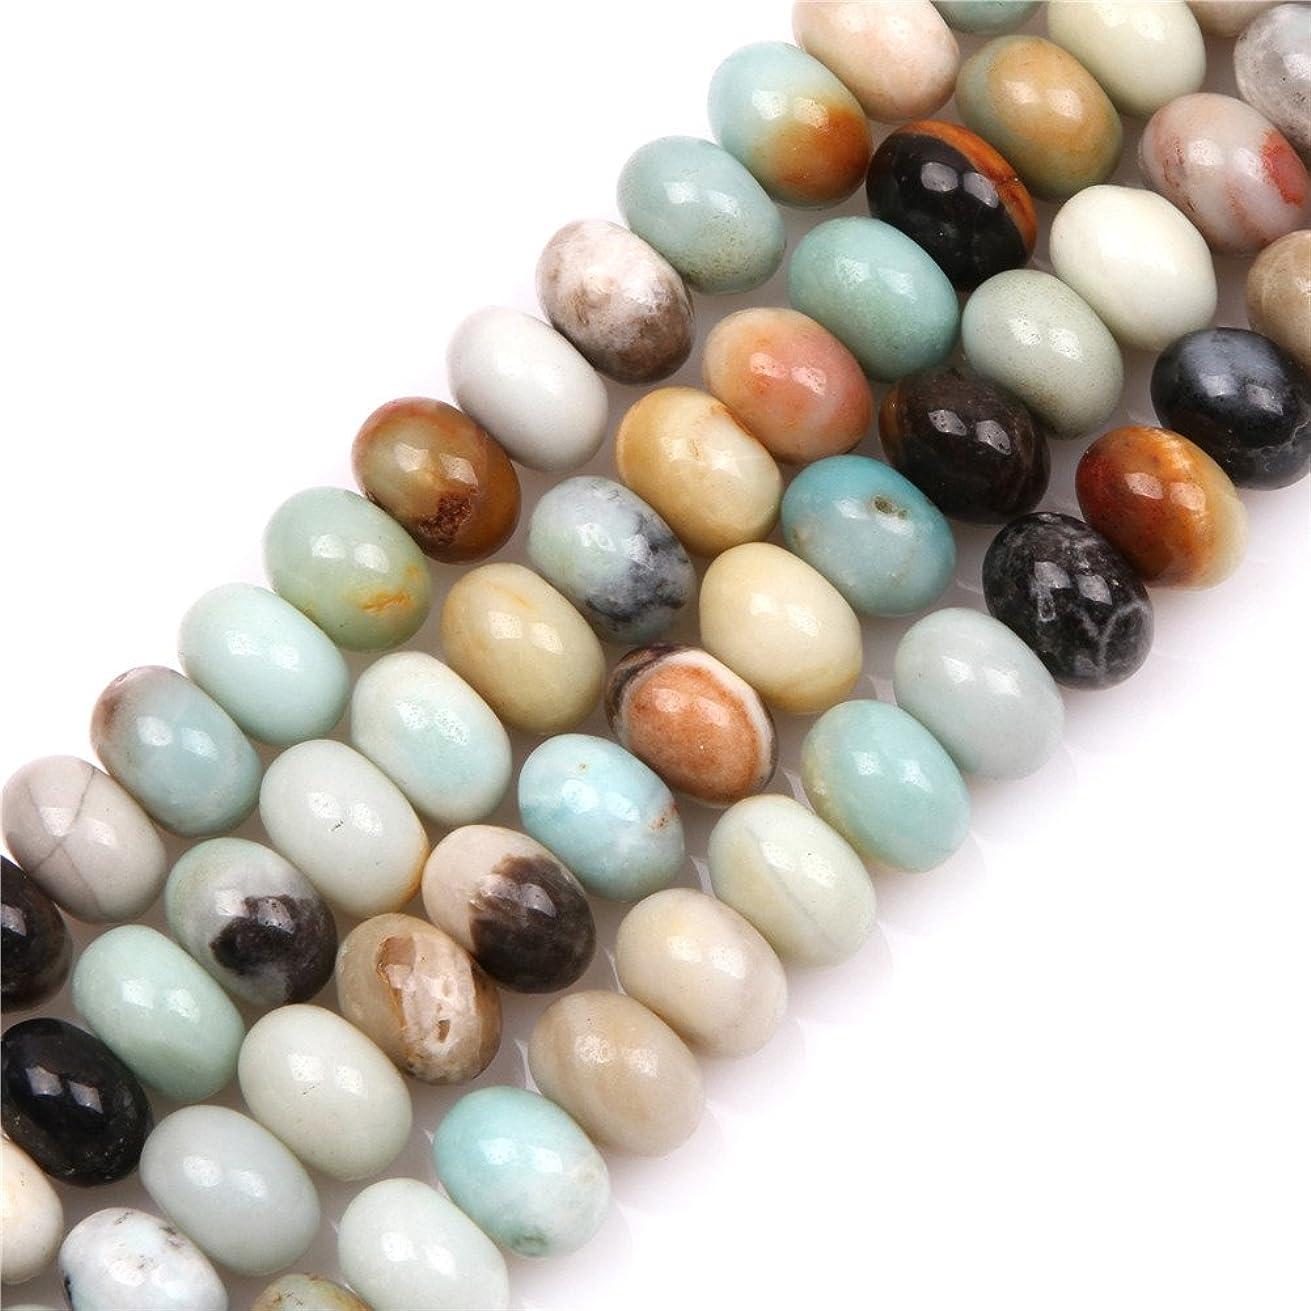 JOE FOREMAN 8x12mm Amazonite Semi Precious Gemstone Rondelle Loose Beads for Jewelry Making DIY Handmade Craft Supplies 15